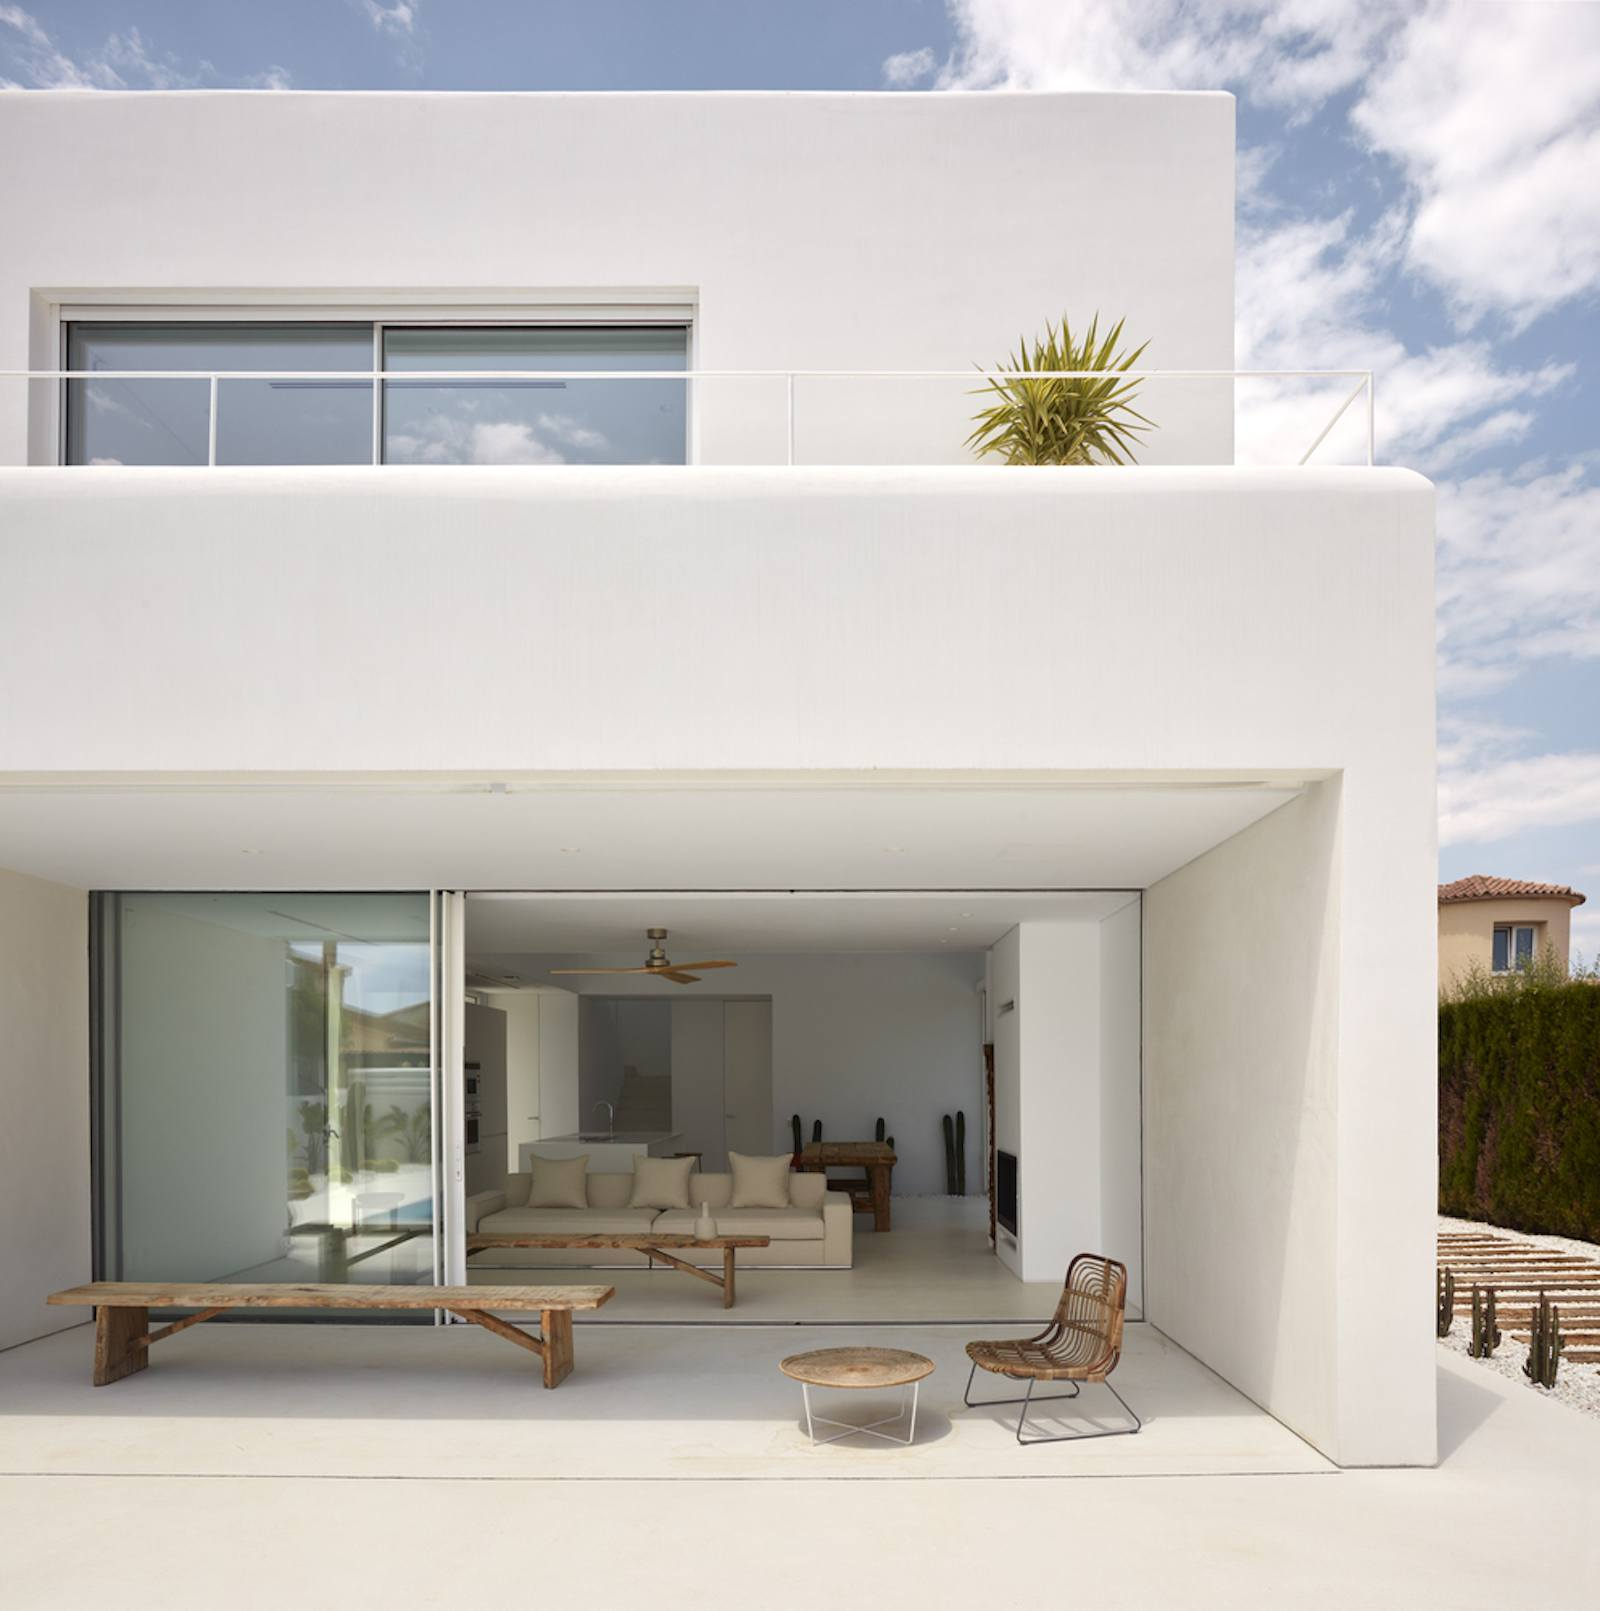 IGNANT-Architecture-Carles-Faus-Arquitectura-Carmen-House-010